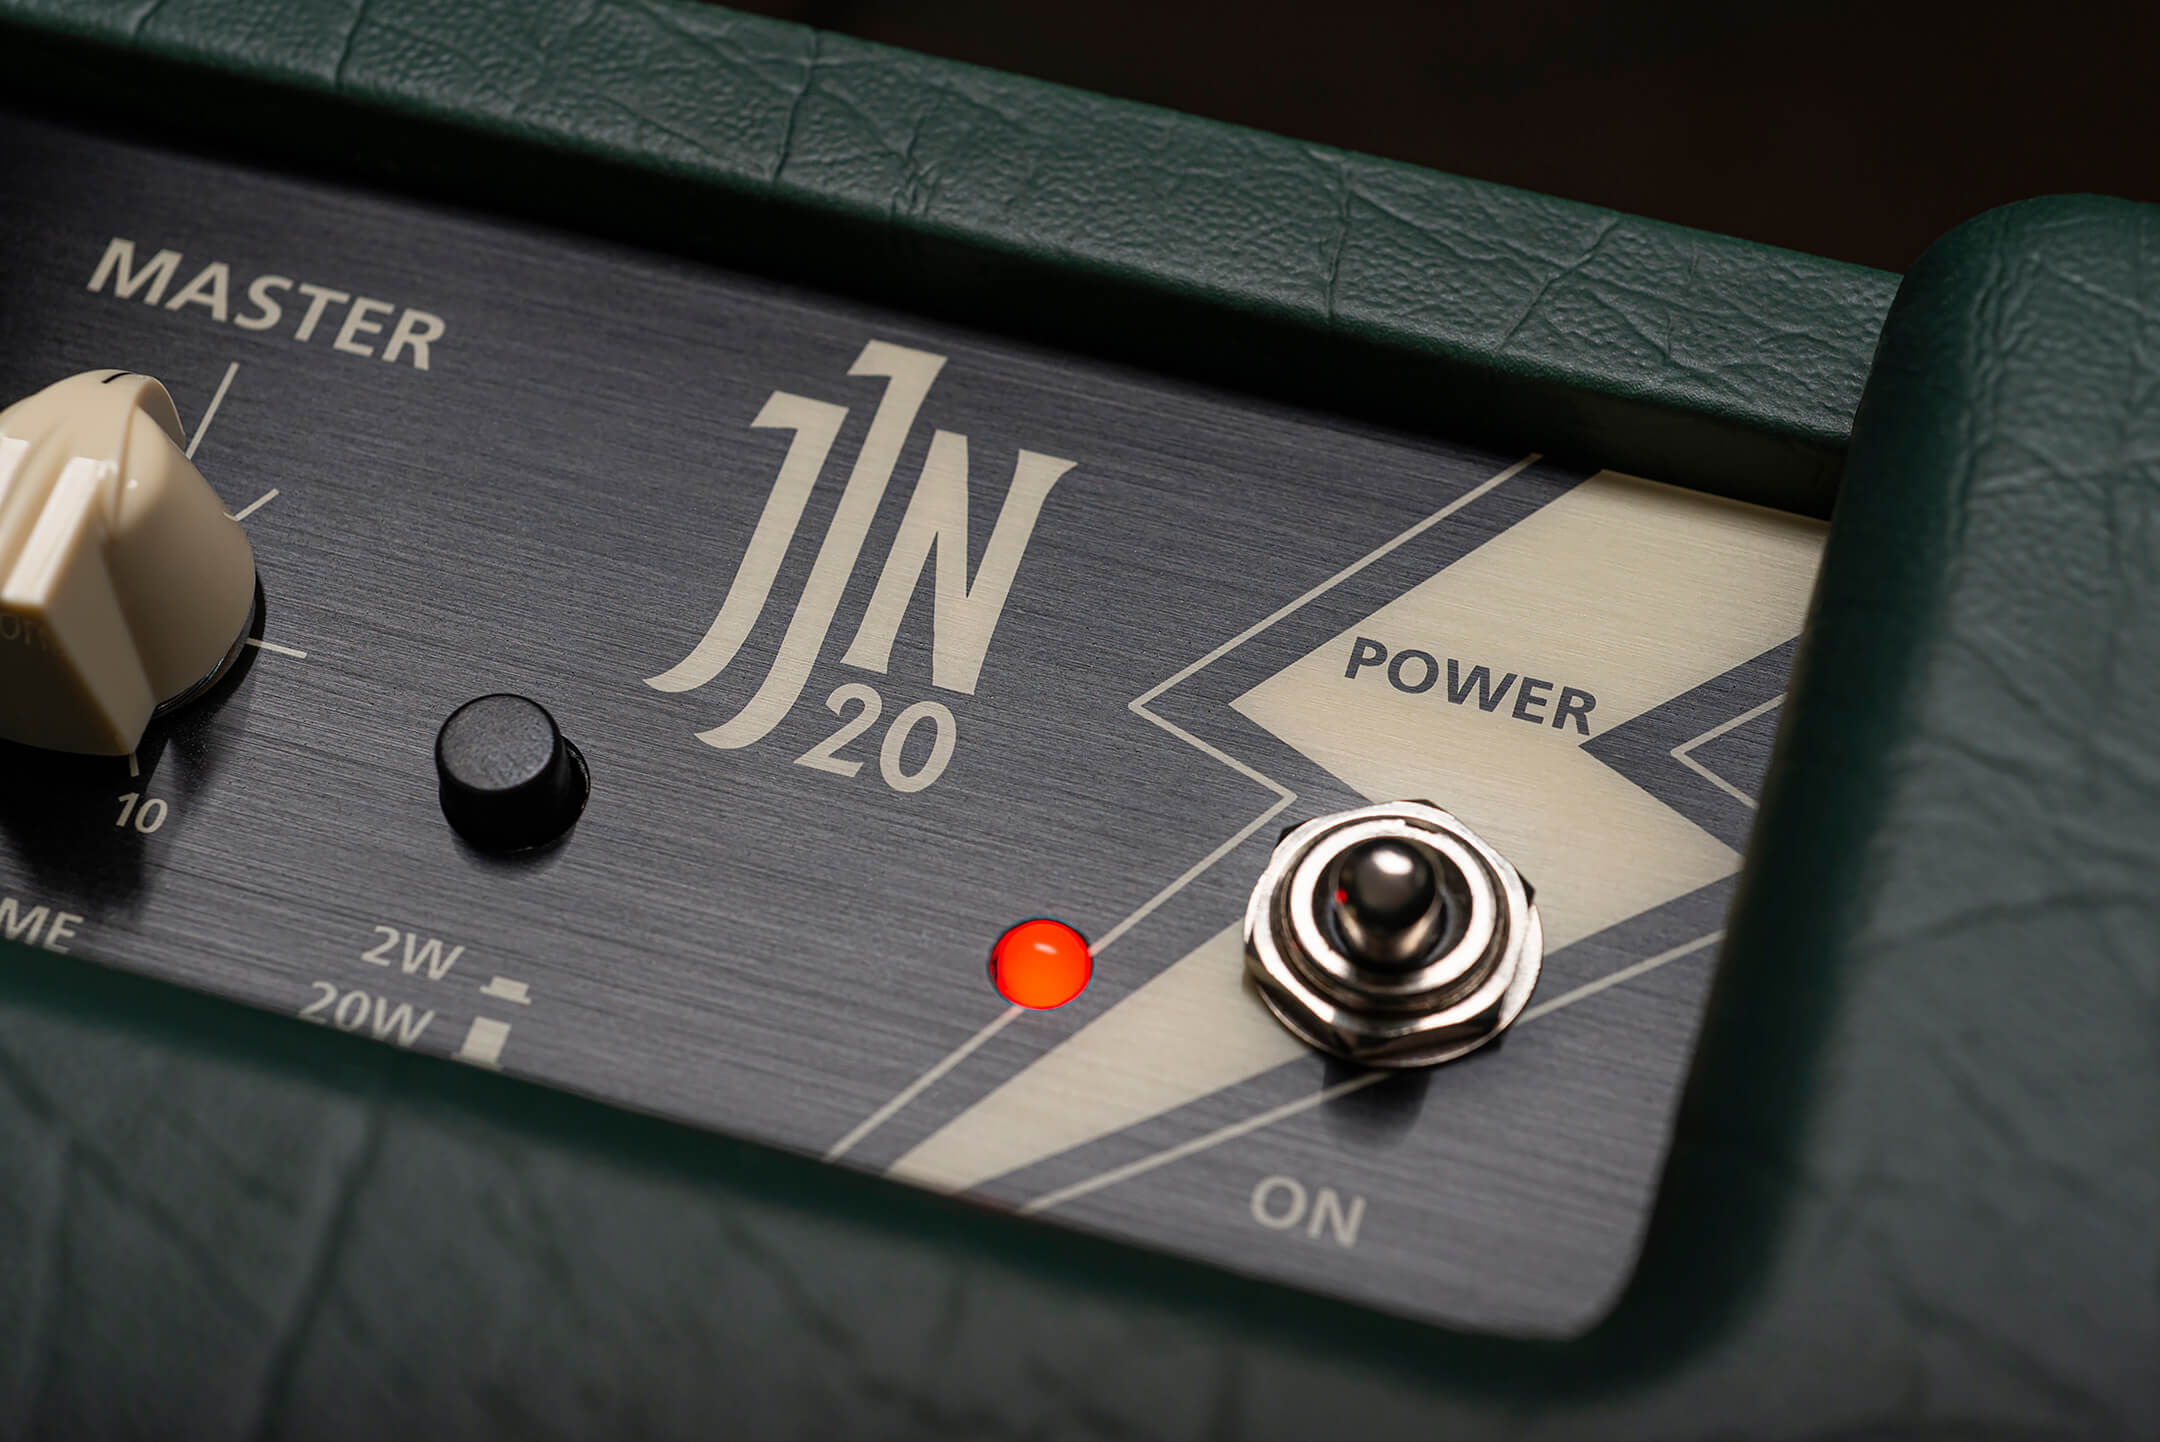 Blackstar JJN 20R Power